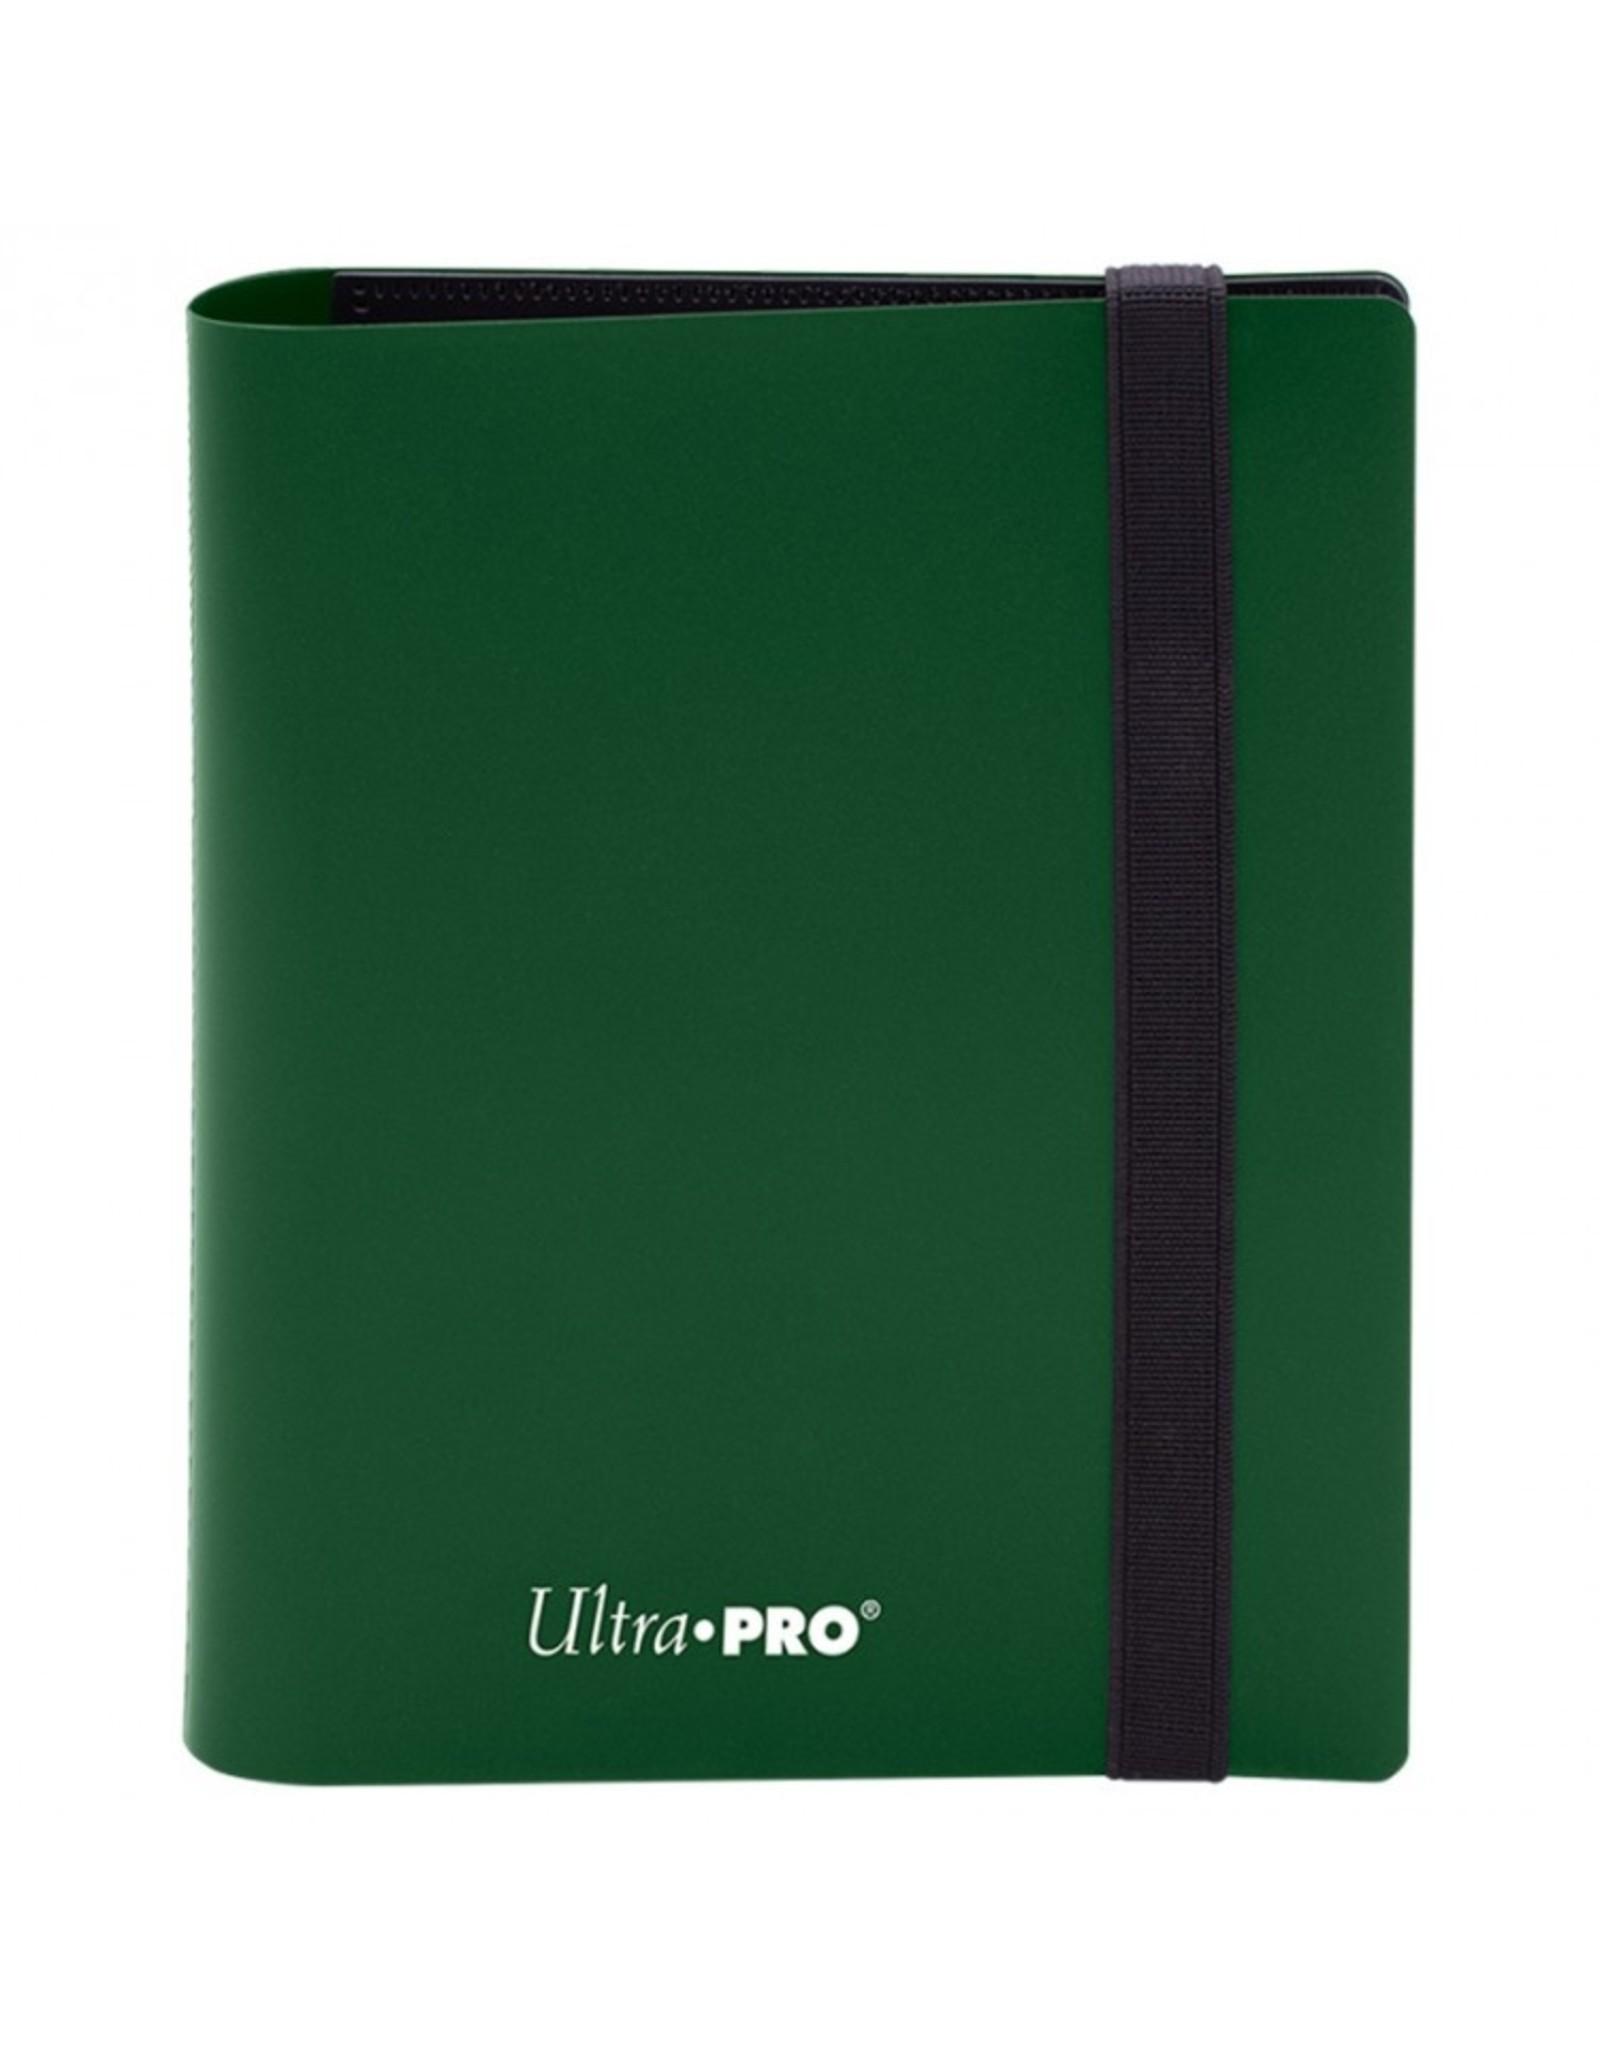 Ultra Pro Binder: 2pkt: PRO: Eclipse: Forest GR